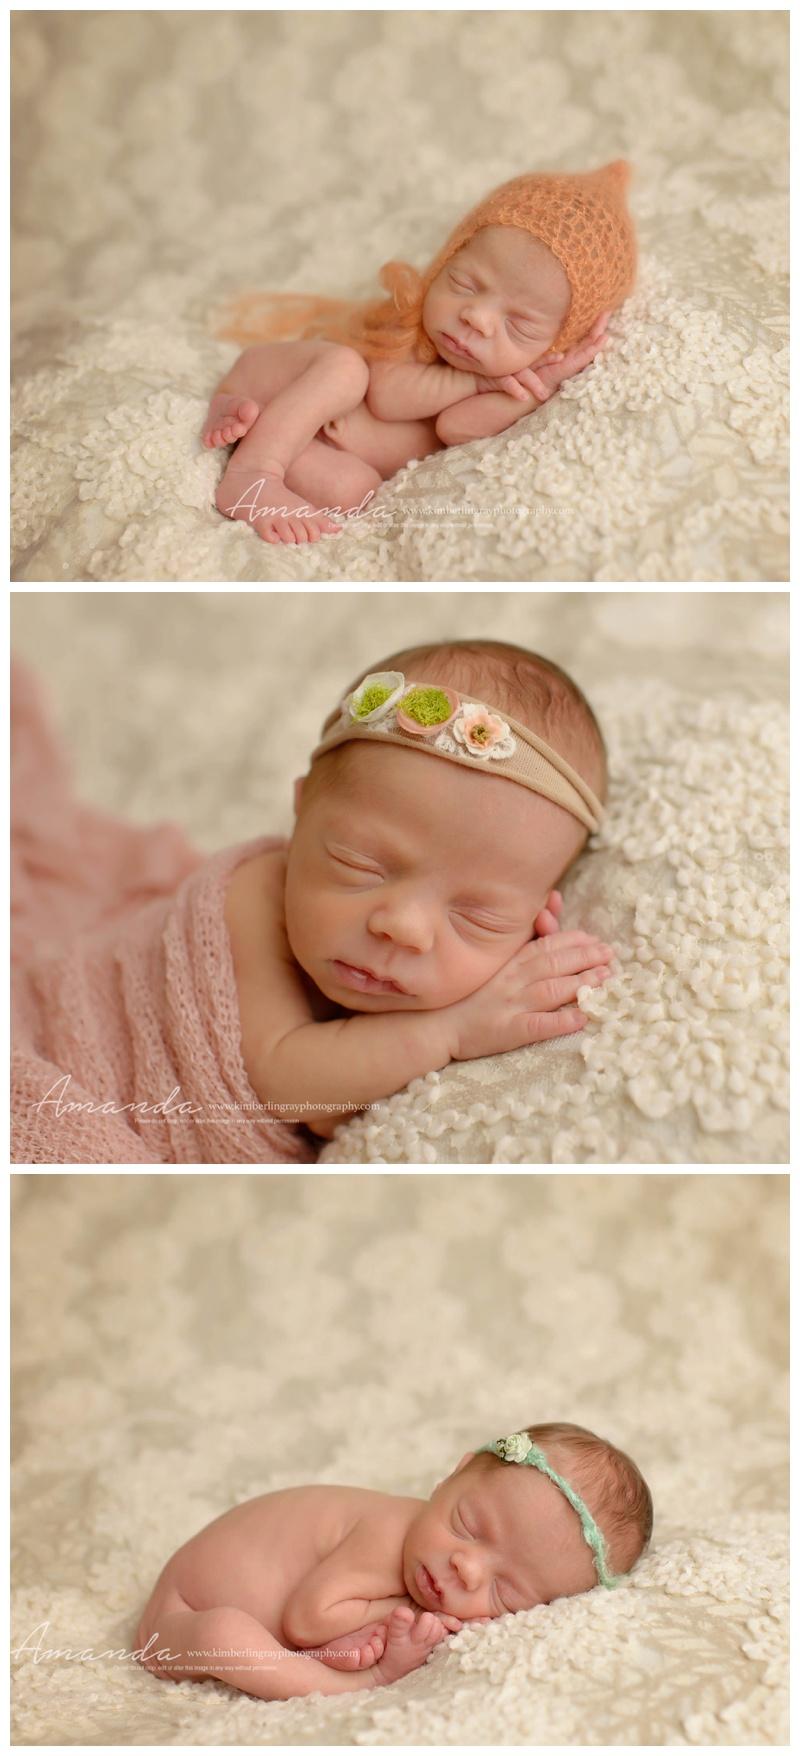 Newborn Smiles perfect pose